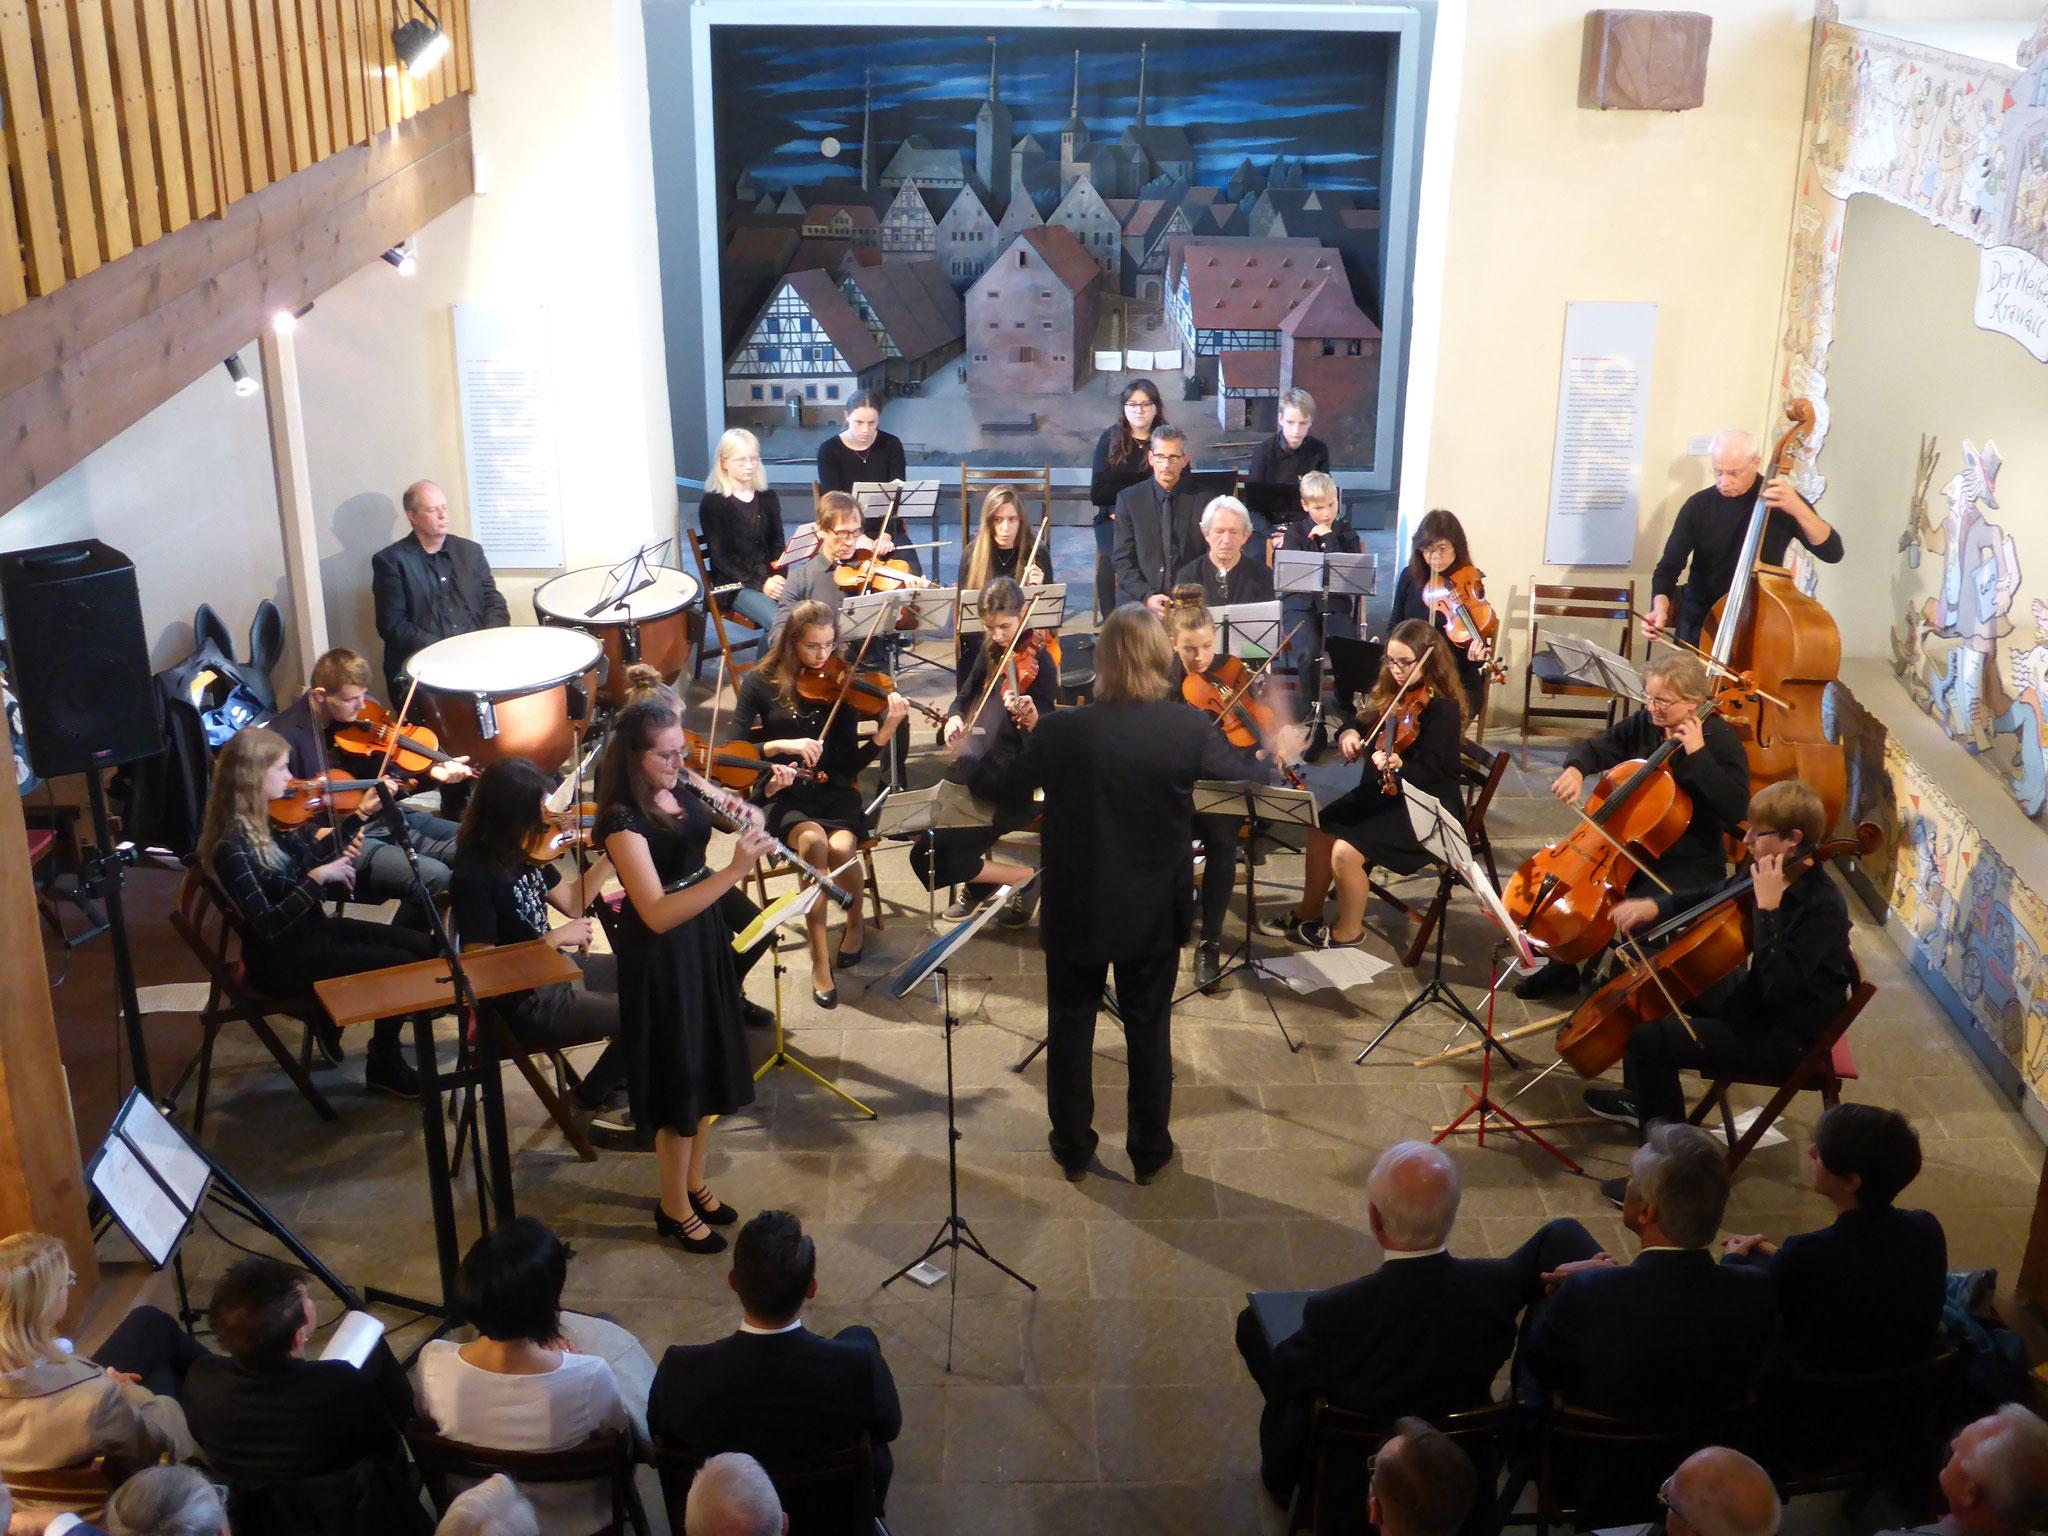 Eröffnung mit dem Orchester der Jugendmusikschule